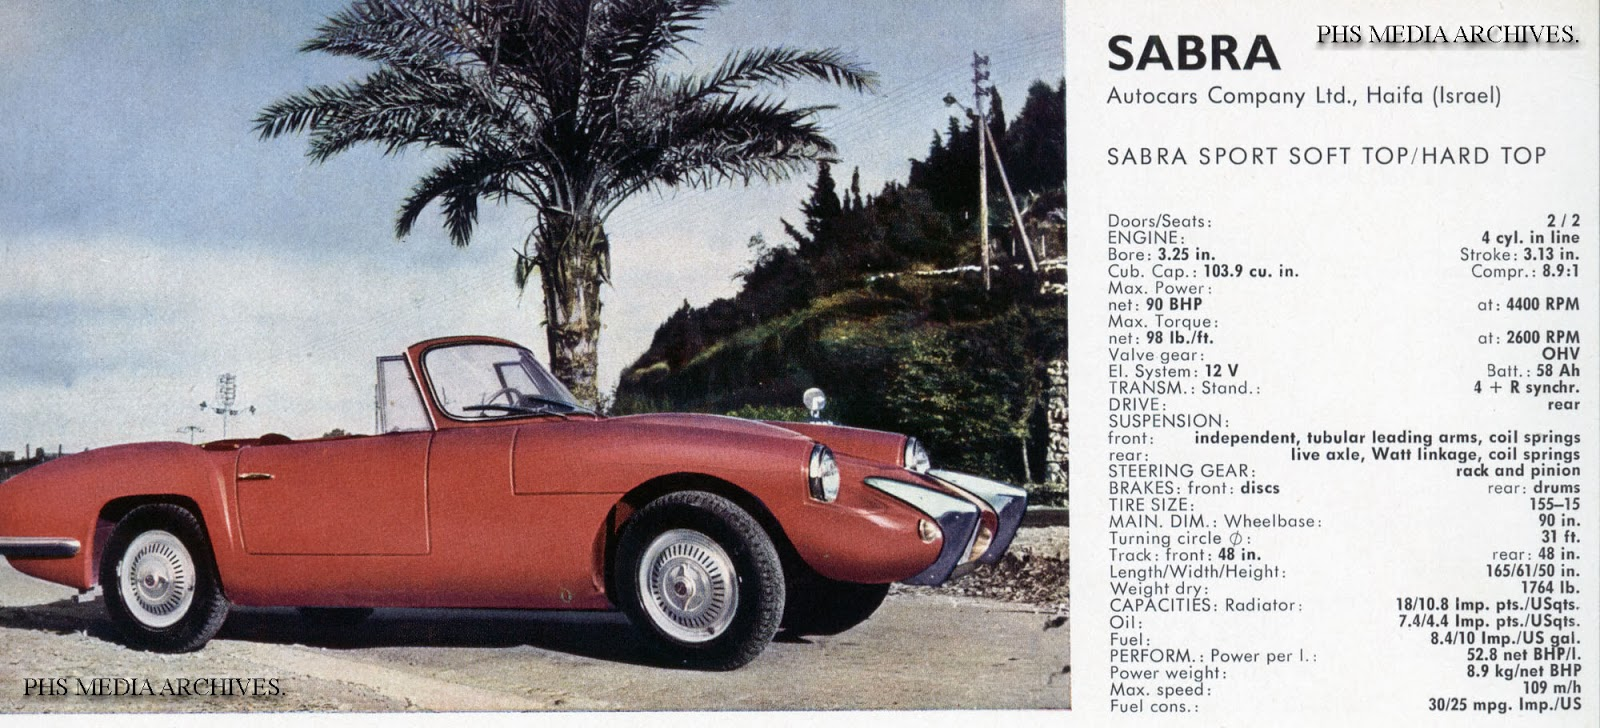 Israeli Sports Cars: 1967 Sabra and Sabra Sport Gran Turismo ...